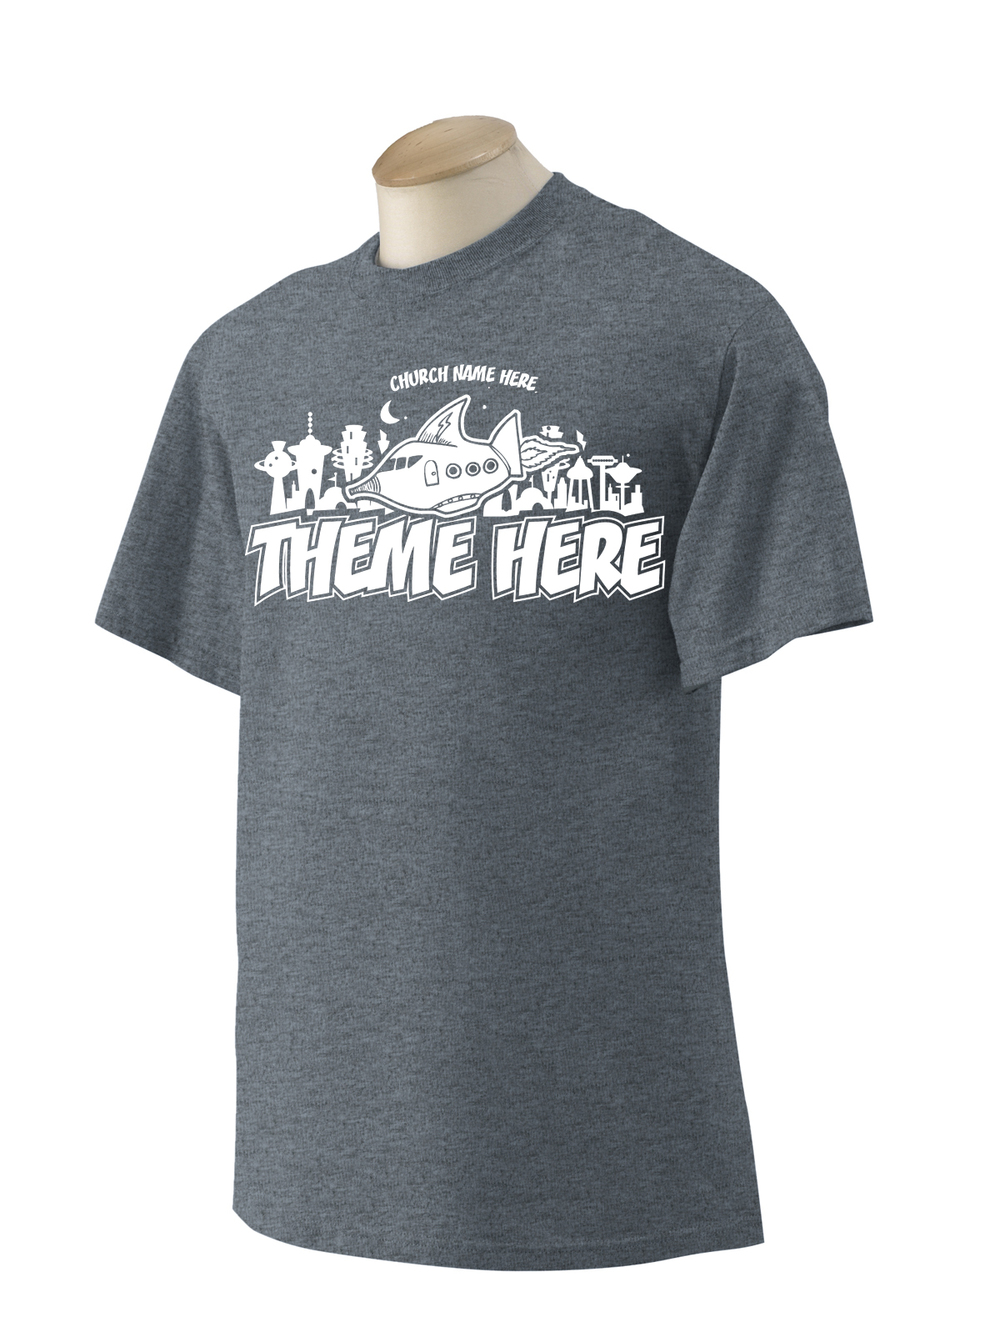 space charcoal shirt.jpg